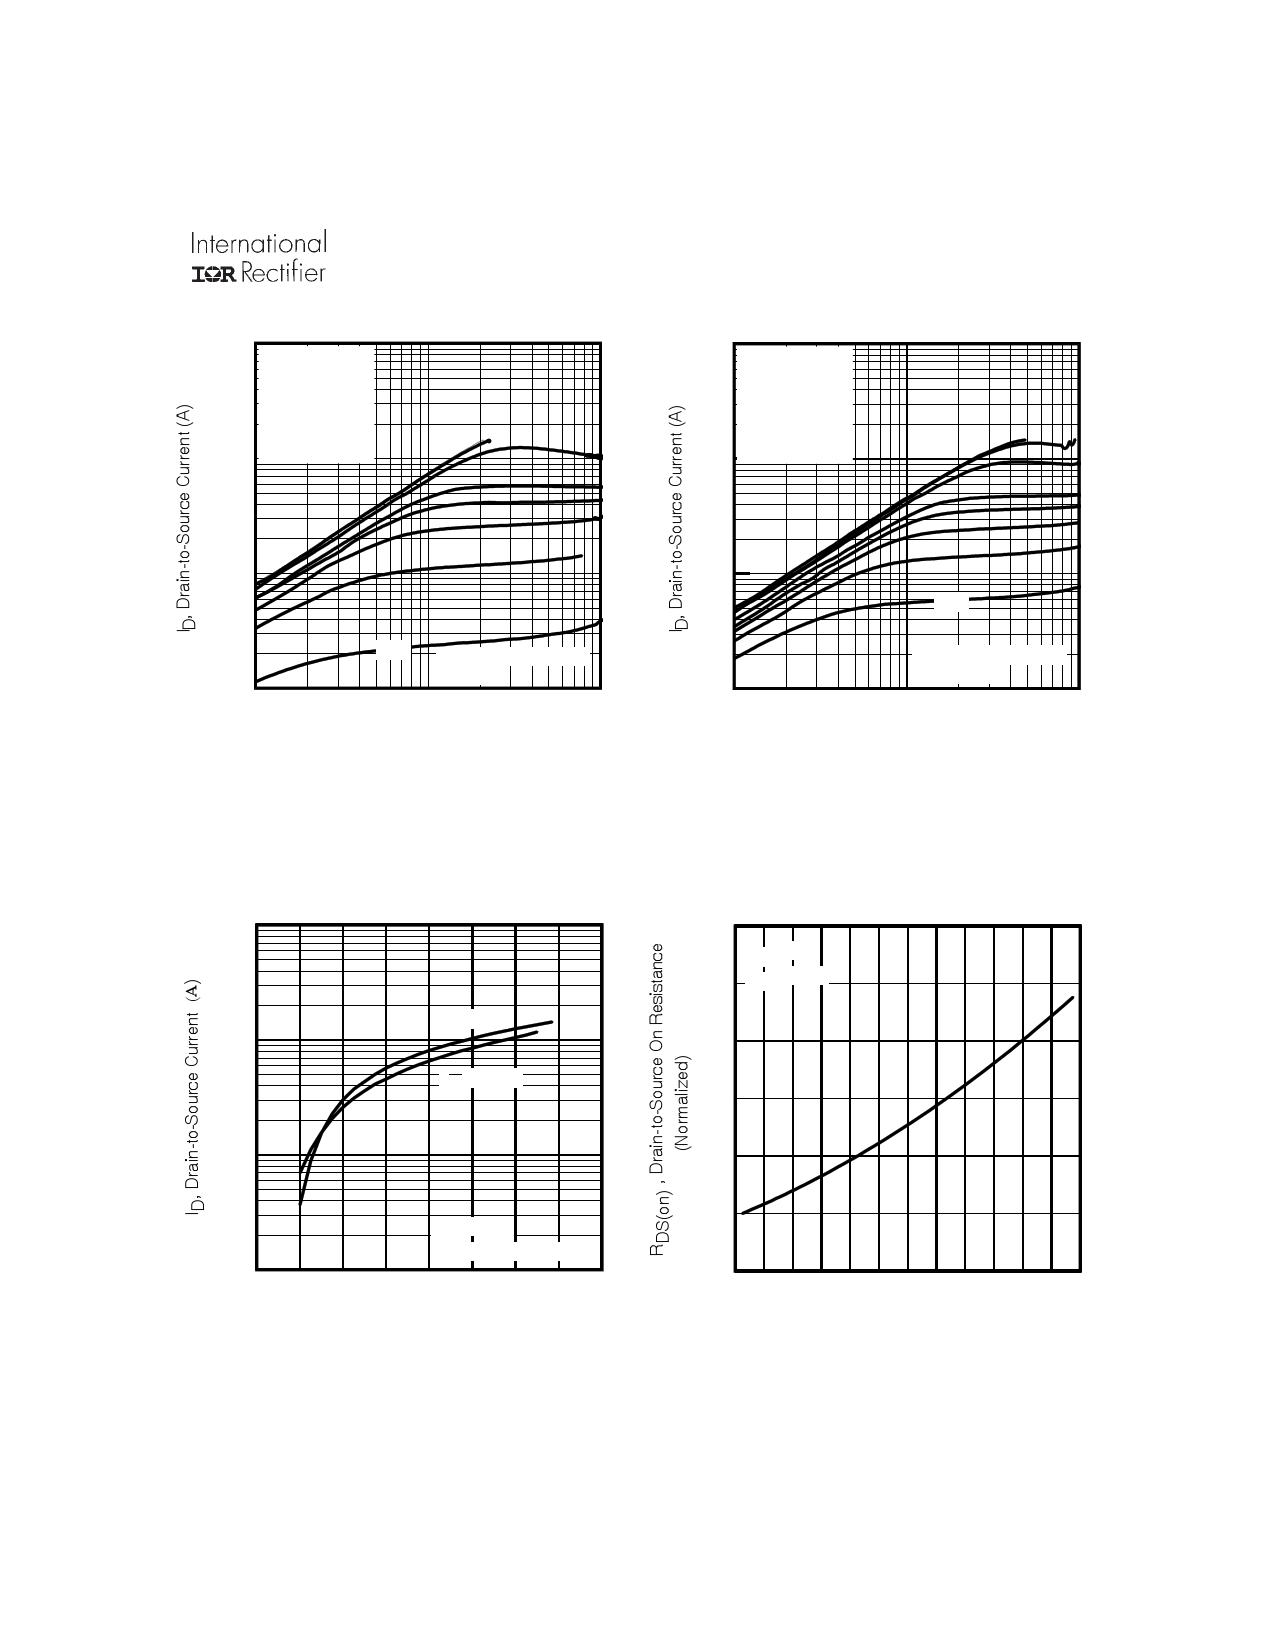 IRL3714ZS pdf, ピン配列